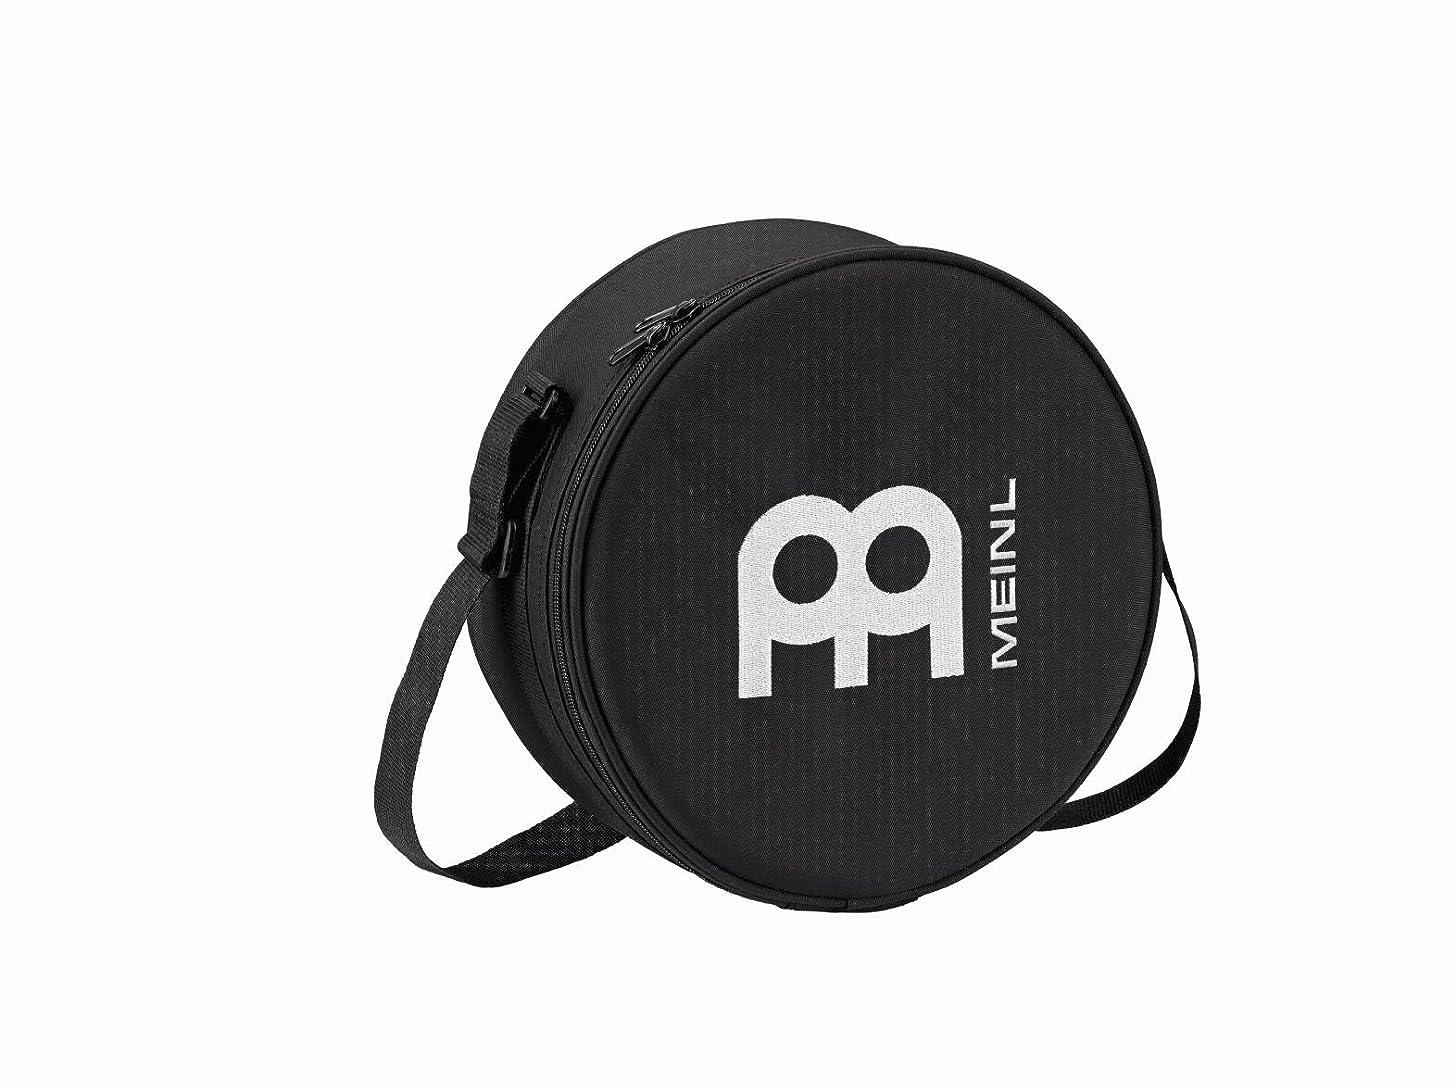 Meinl Percussion MFDB-7KA Professional Kanjira Bag (8.5 x 2.5 inches), Black